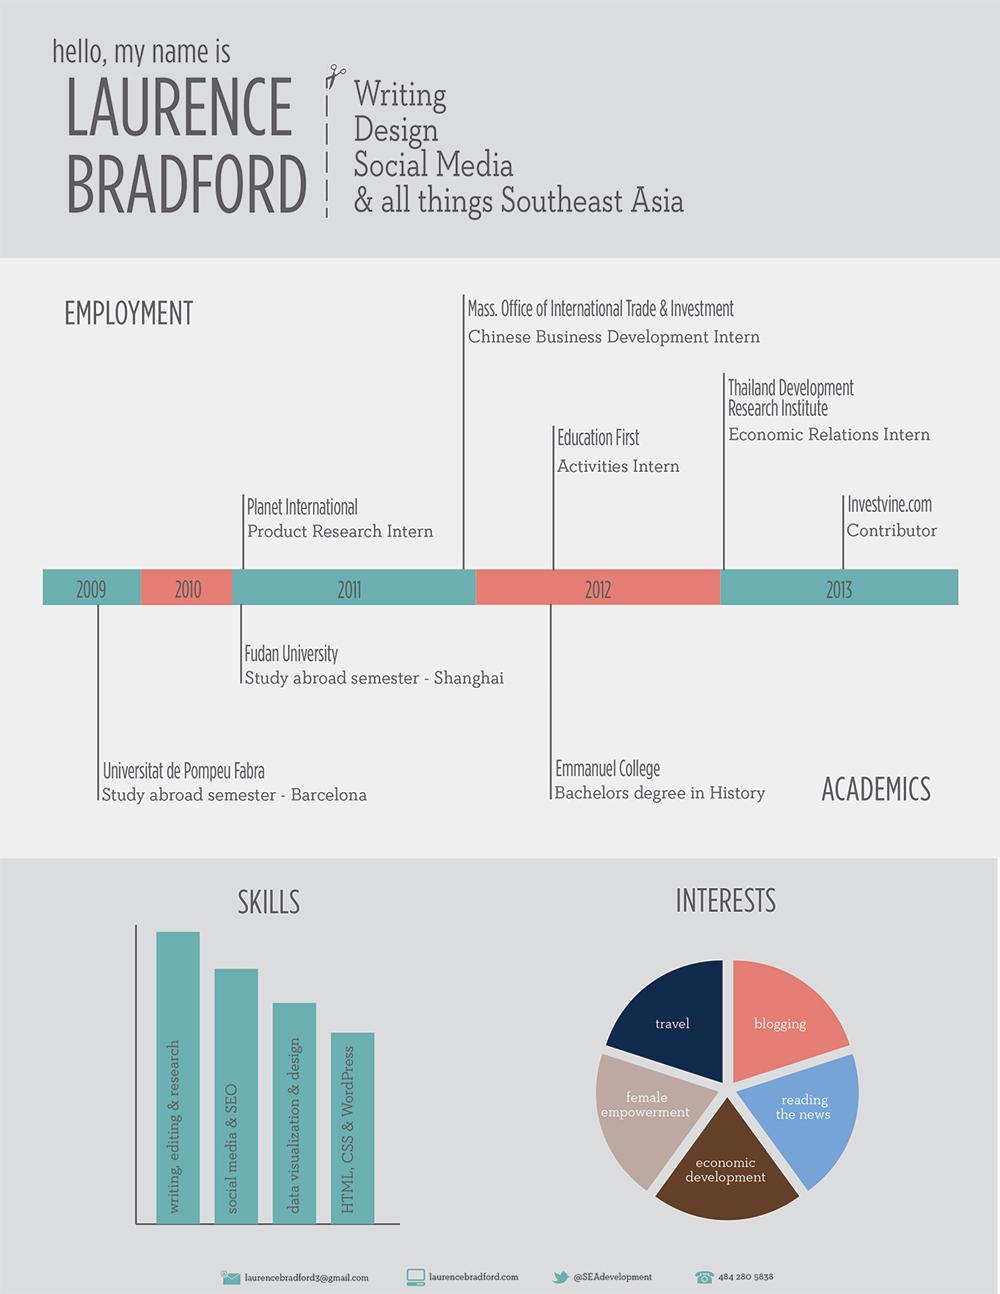 visual resume - Laurence Bradford